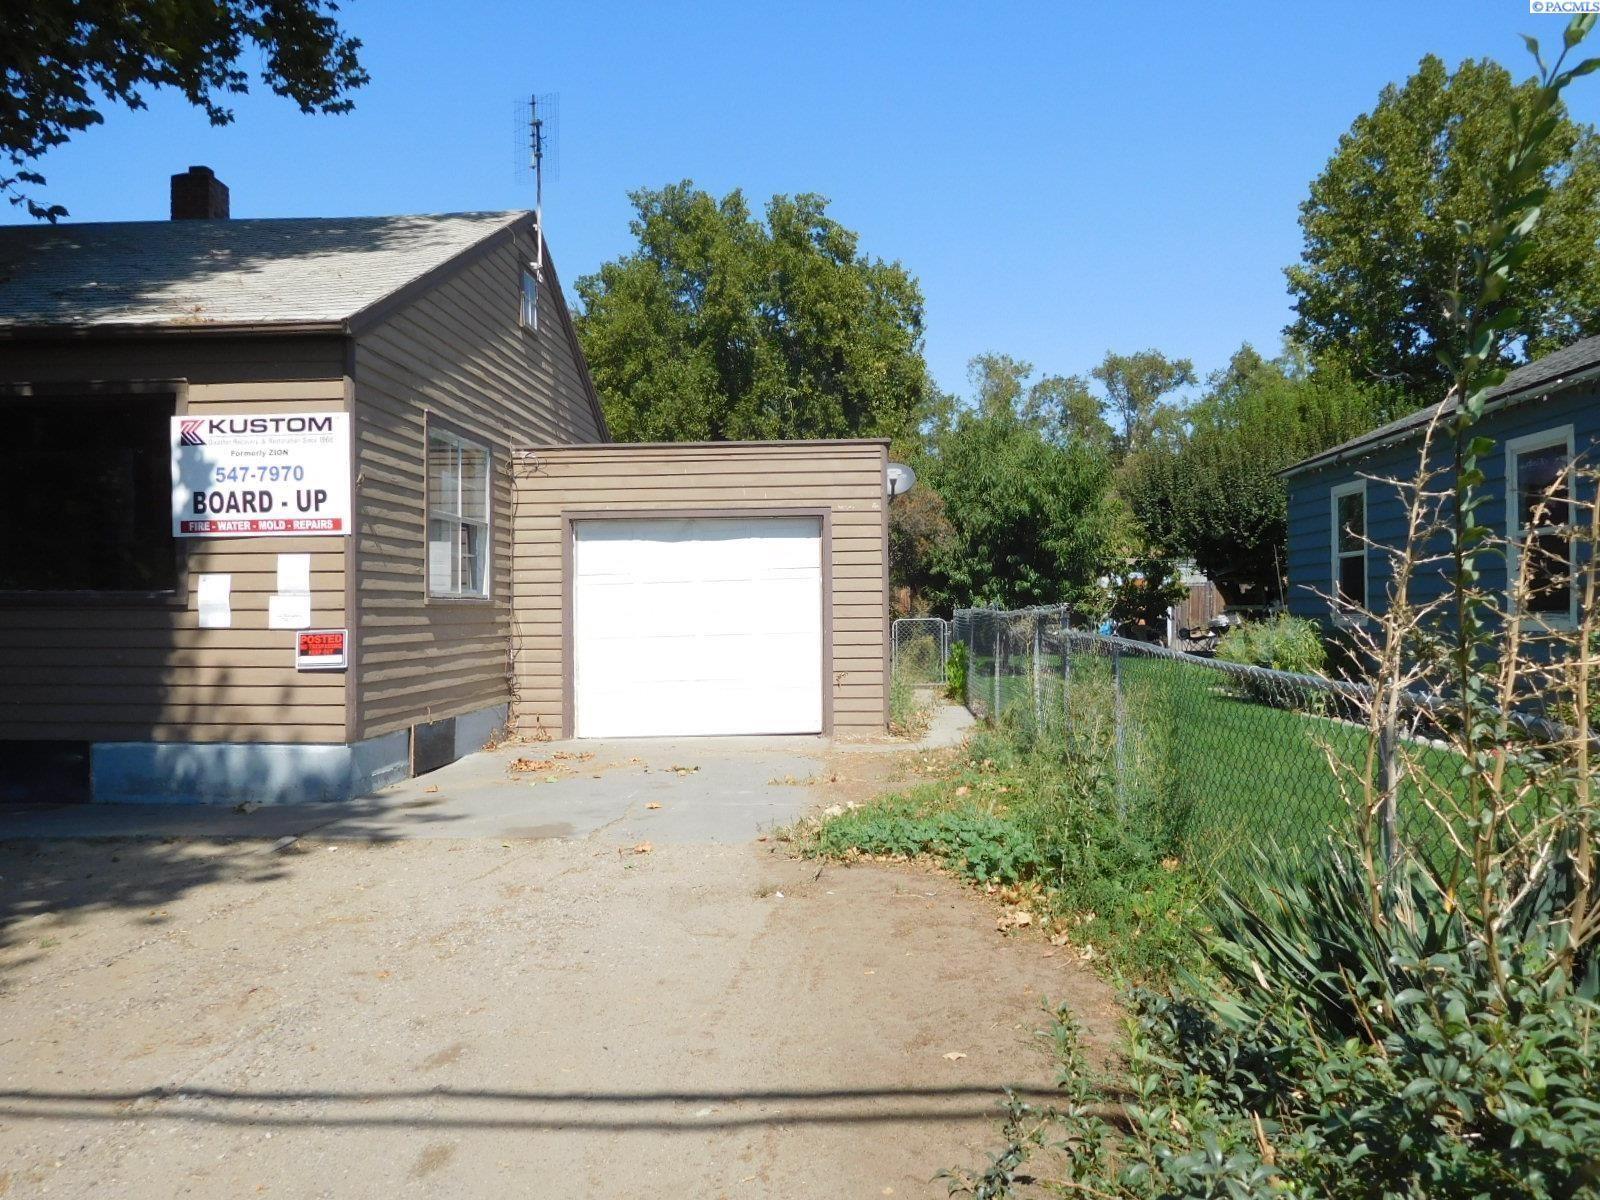 Photo of 1515 W Clark St, Pasco, WA 99301 (MLS # 256375)